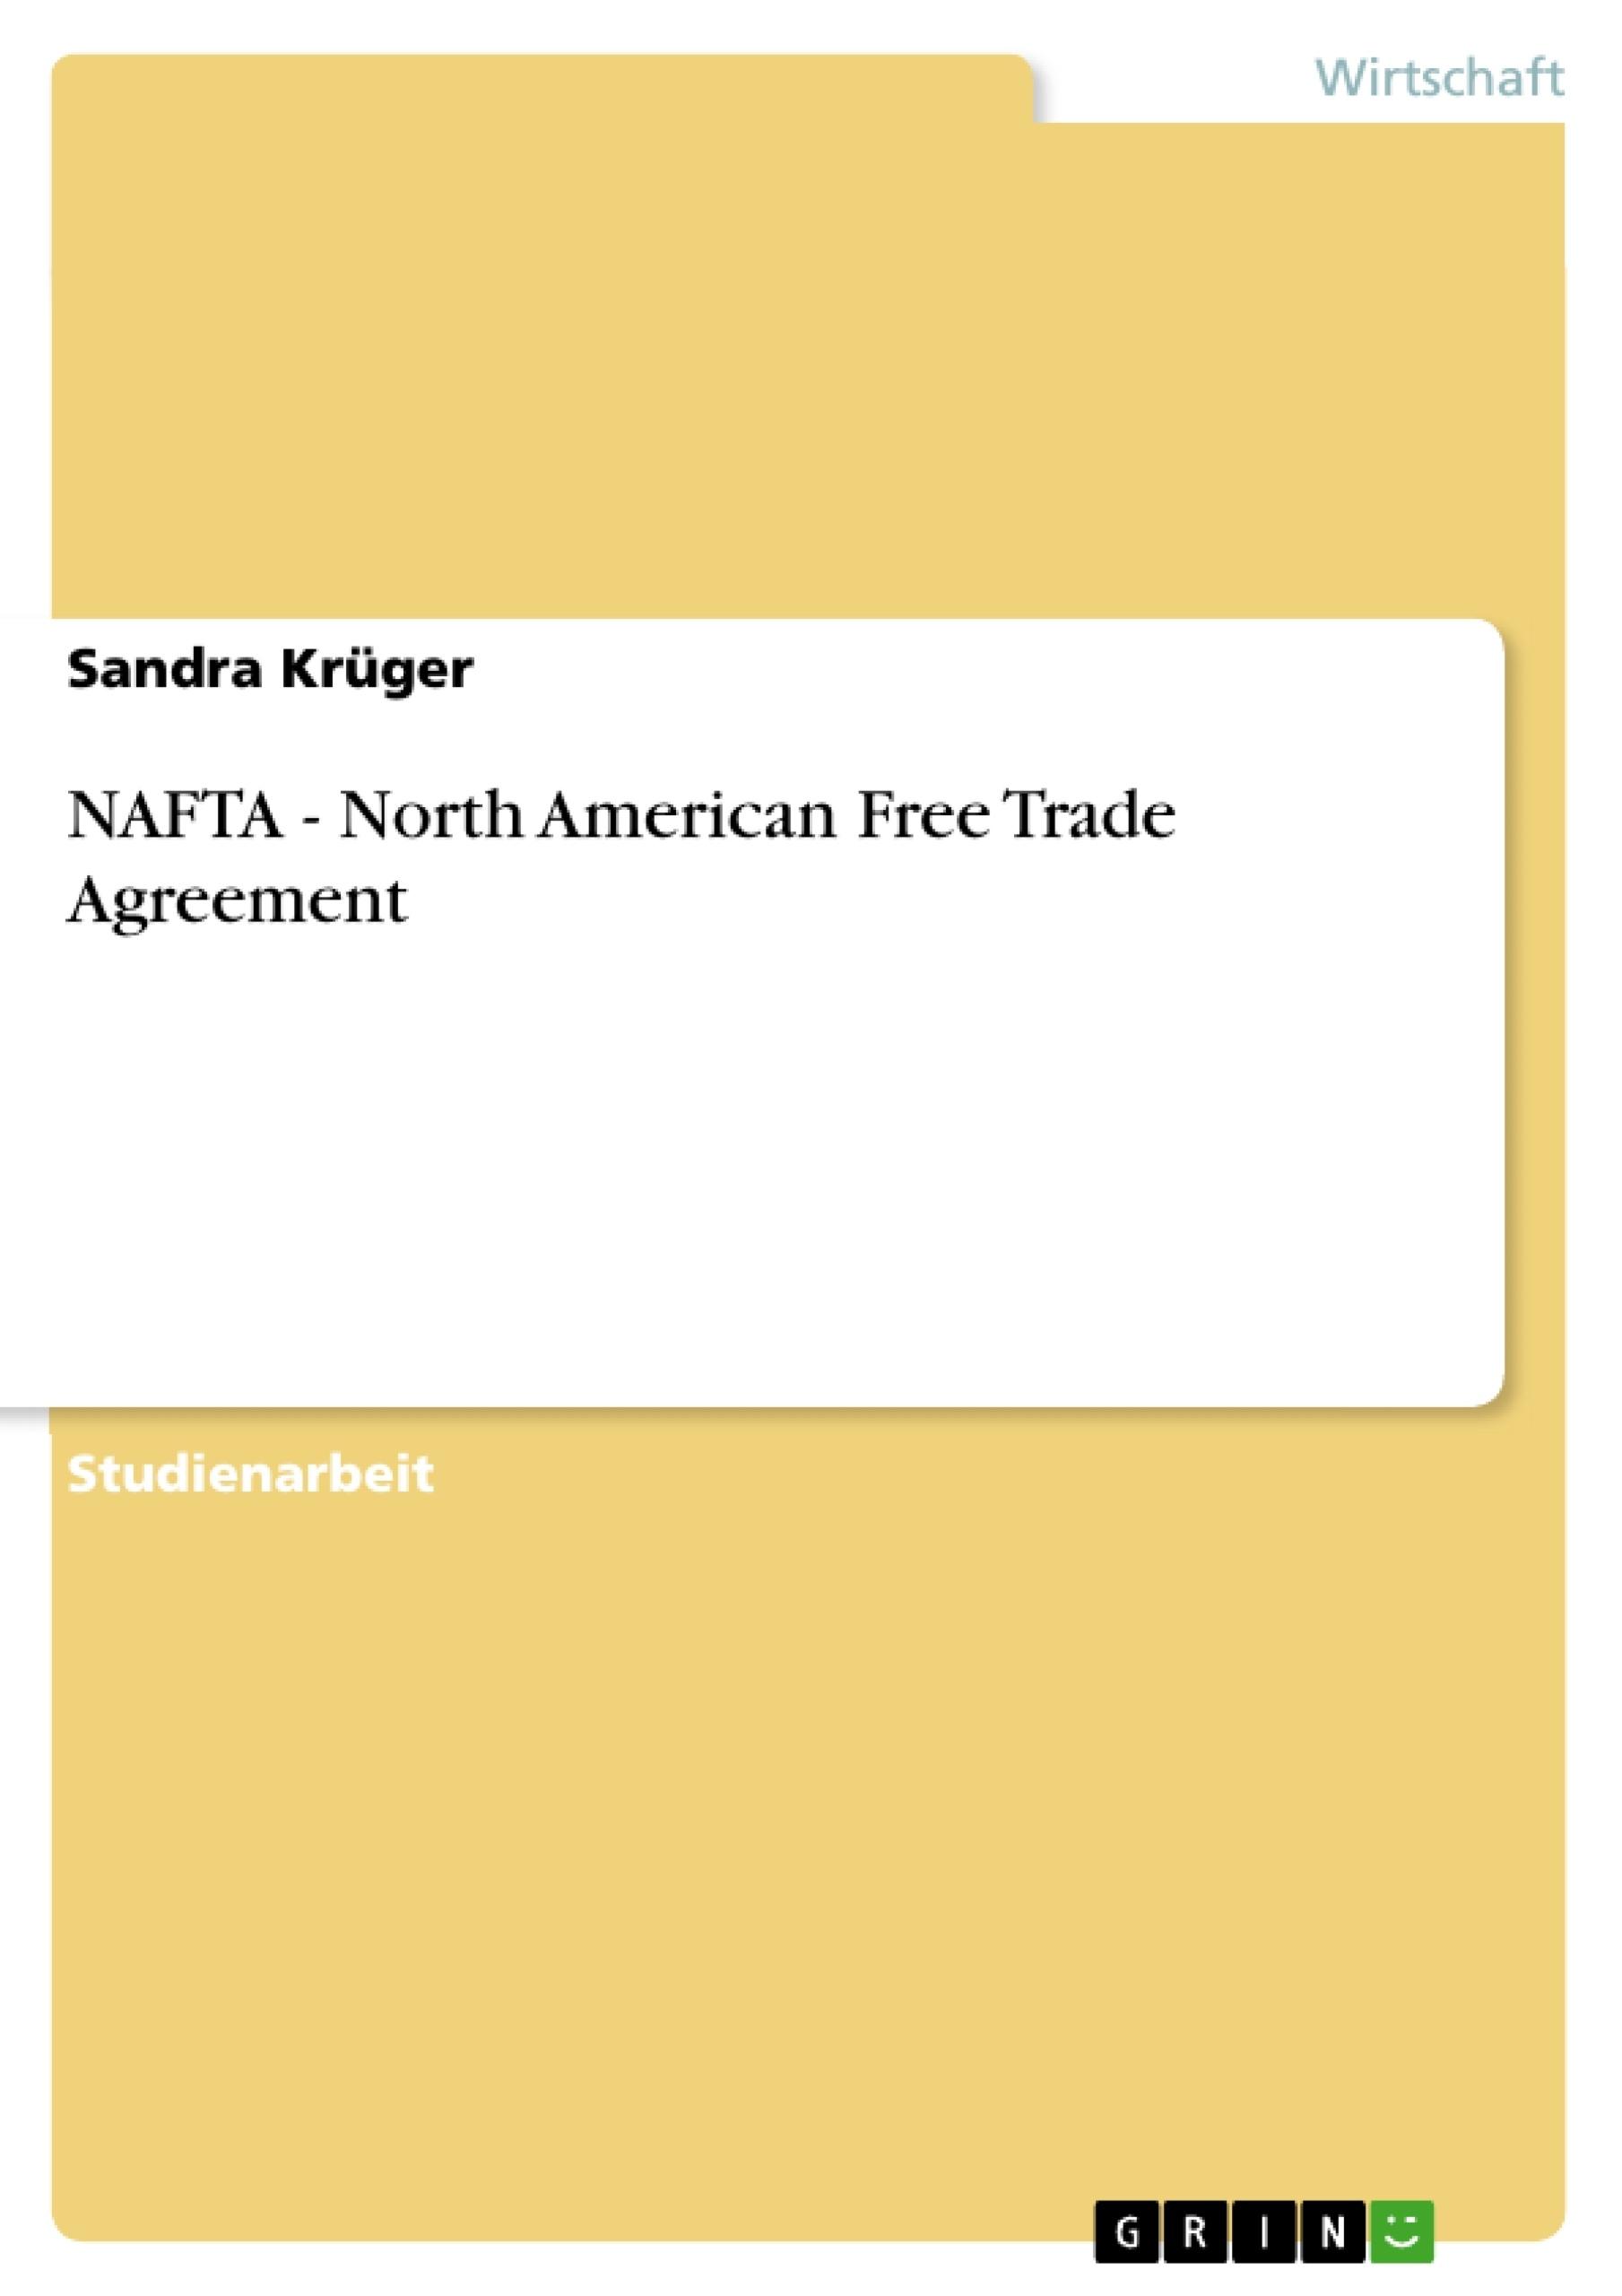 NAFTA - North American Free Trade Agreement   Masterarbeit ...